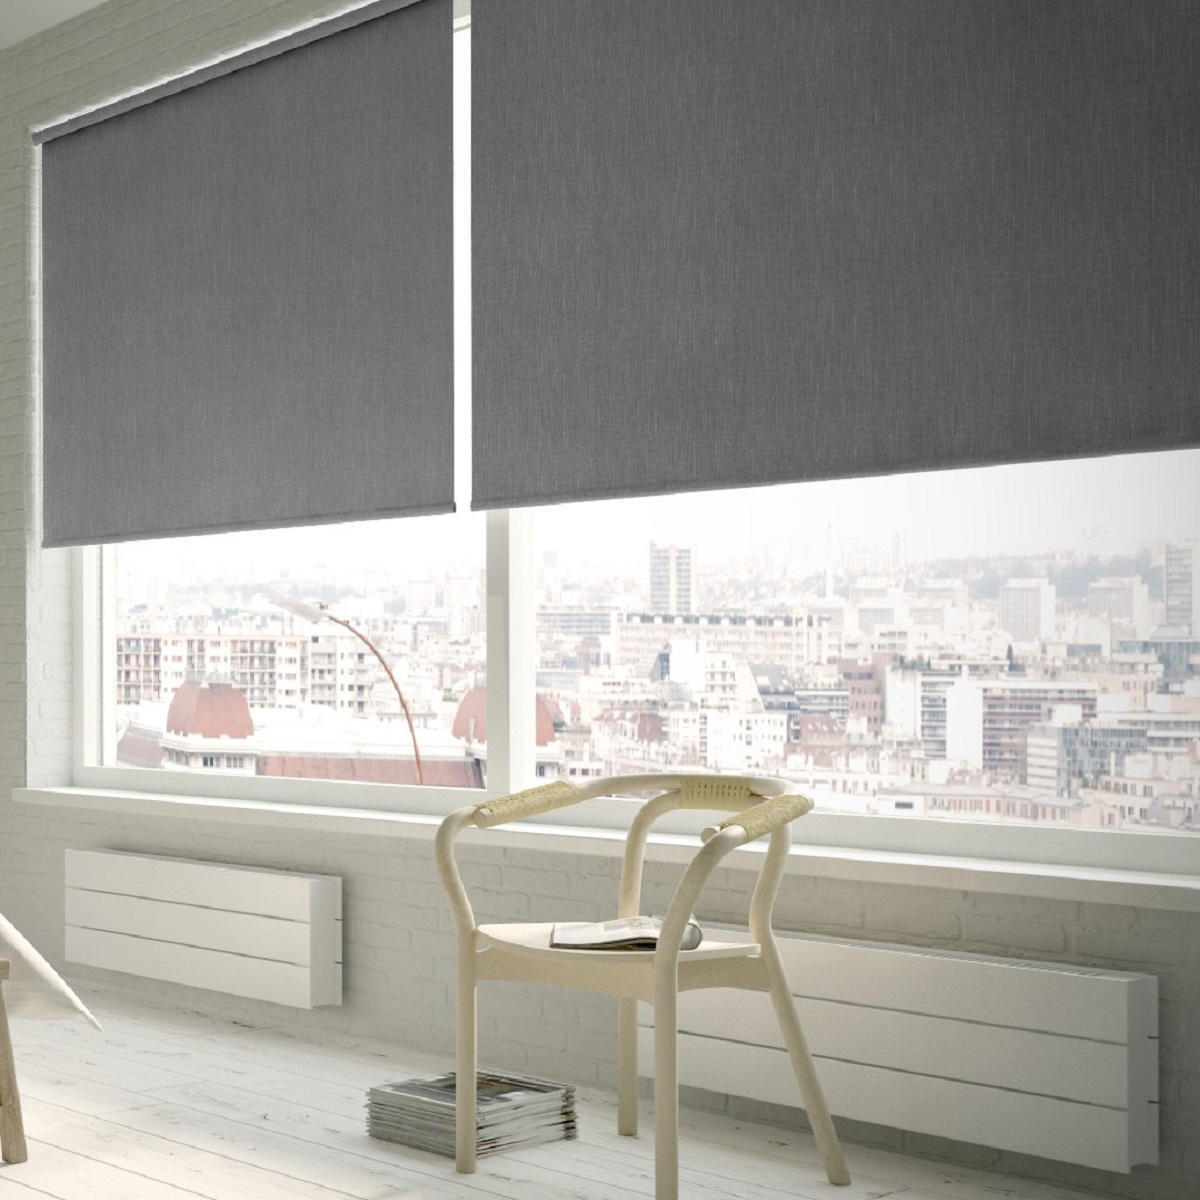 Tenda a rullo oscurante Texture grigio 150 x 250 cm - 1